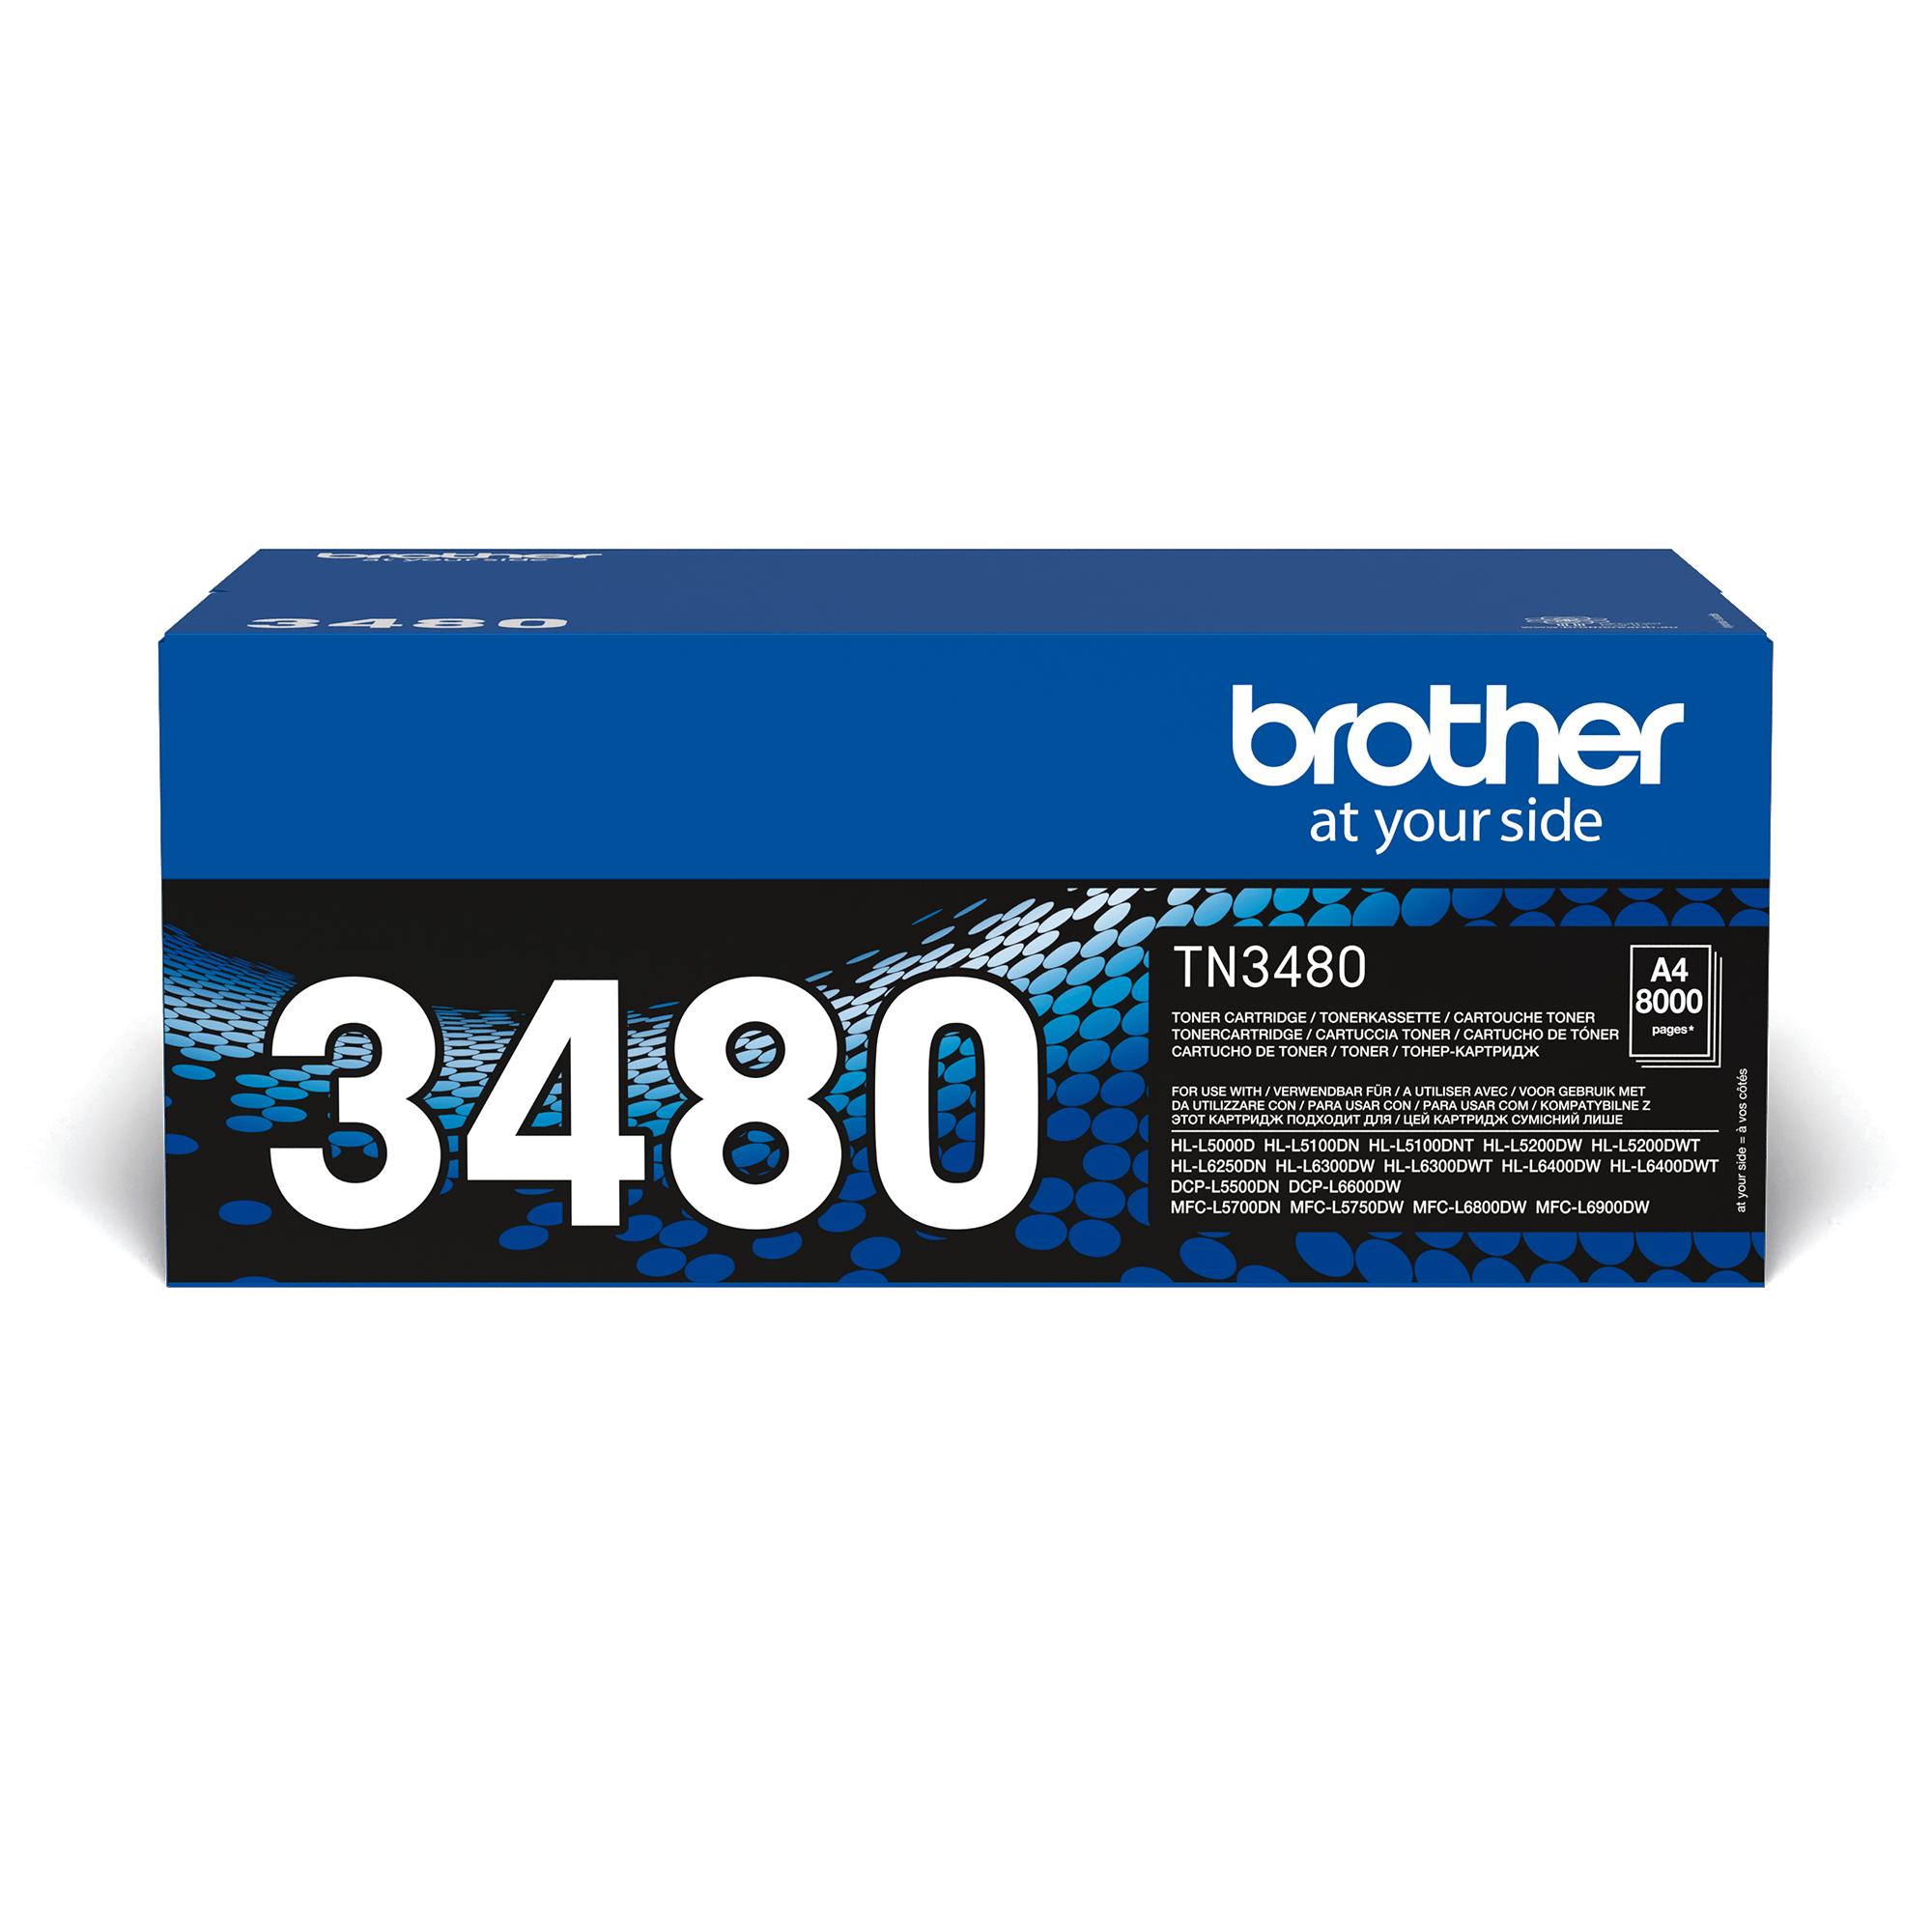 Toner TN-3480 Original Brother – Schwarz